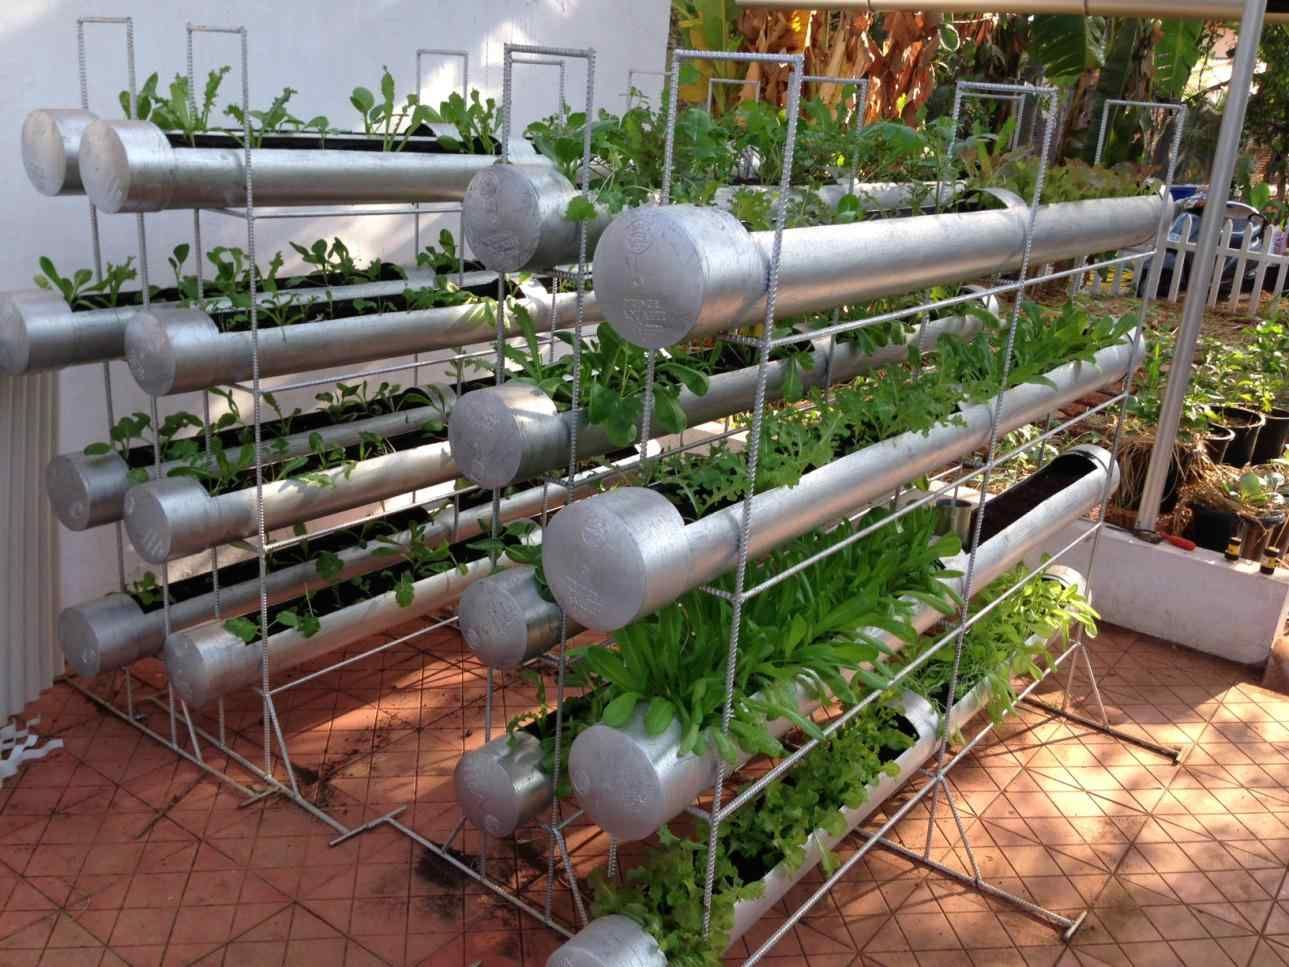 Roof Garden Vegetables Home Roof Ideas Terraced Vegetable Garden Garden Layout Vegetable Small Vegetable Gardens